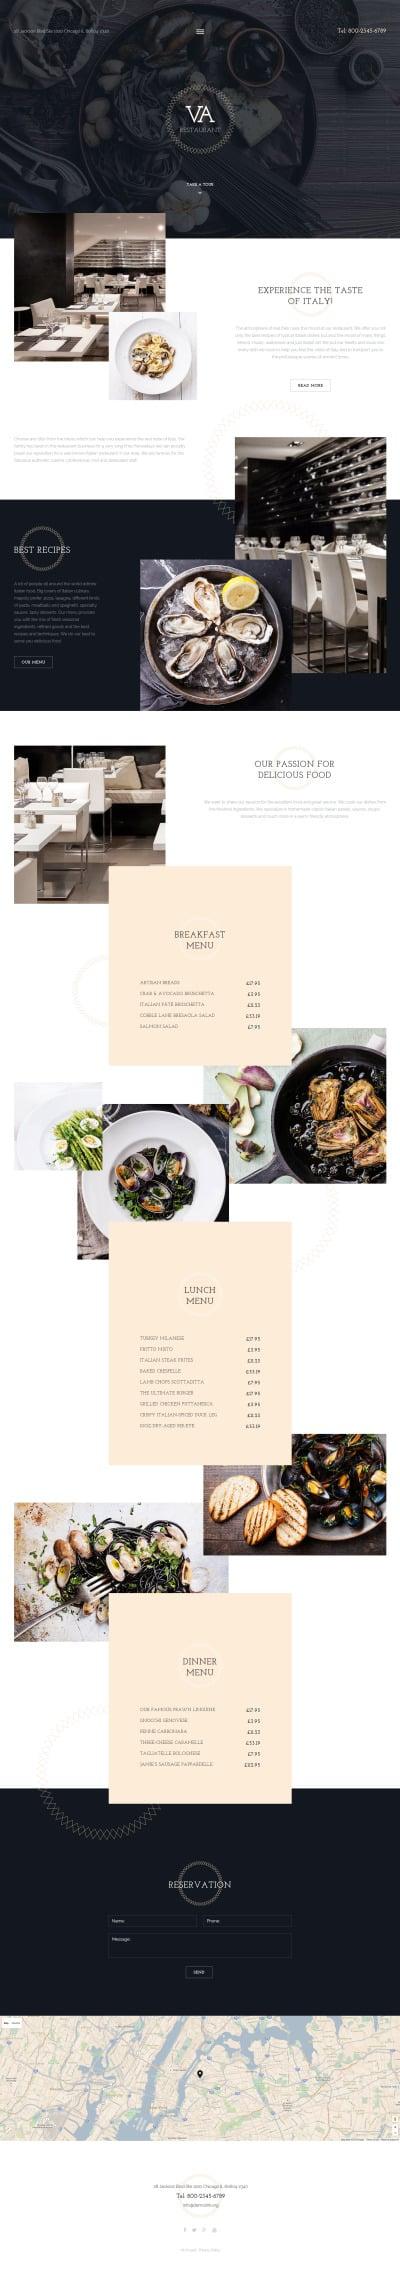 Cafe and Restaurant Responsive Joomla šablona